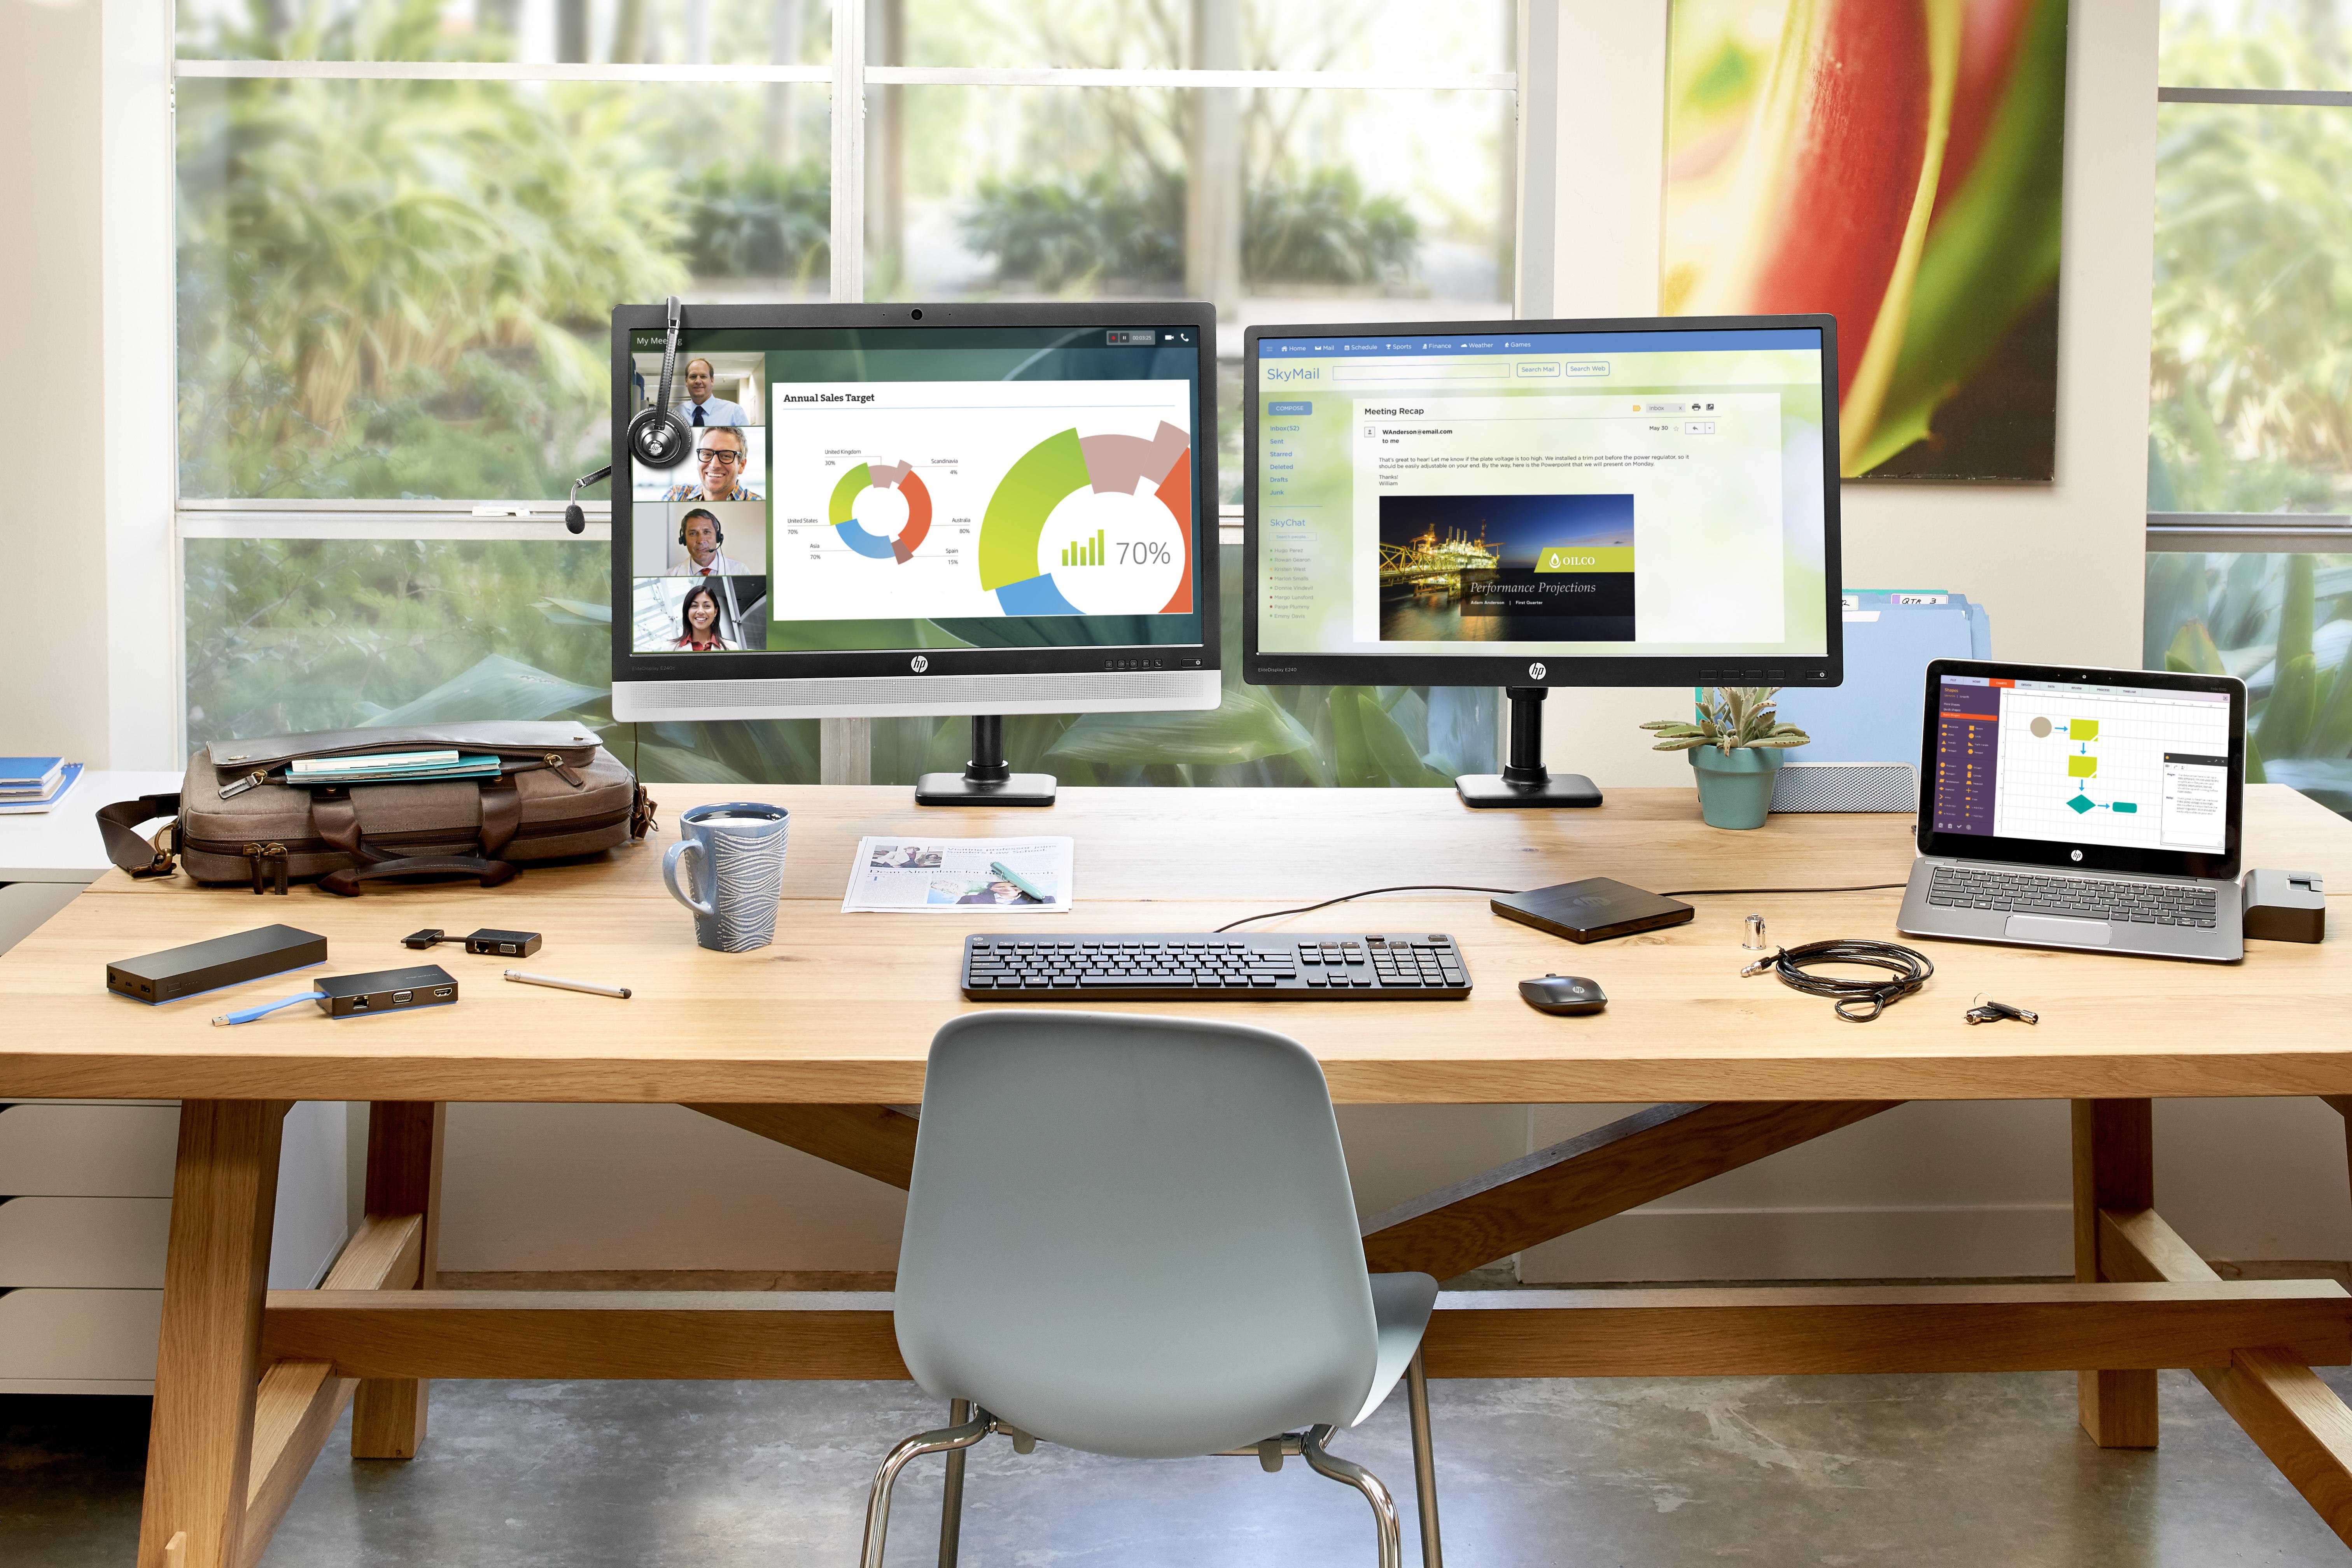 HP EliteBook 840 G3 W4Z92AW#ABU Core i5 6300U 8GB 500GB 14IN BT CAM Win 10  Pro